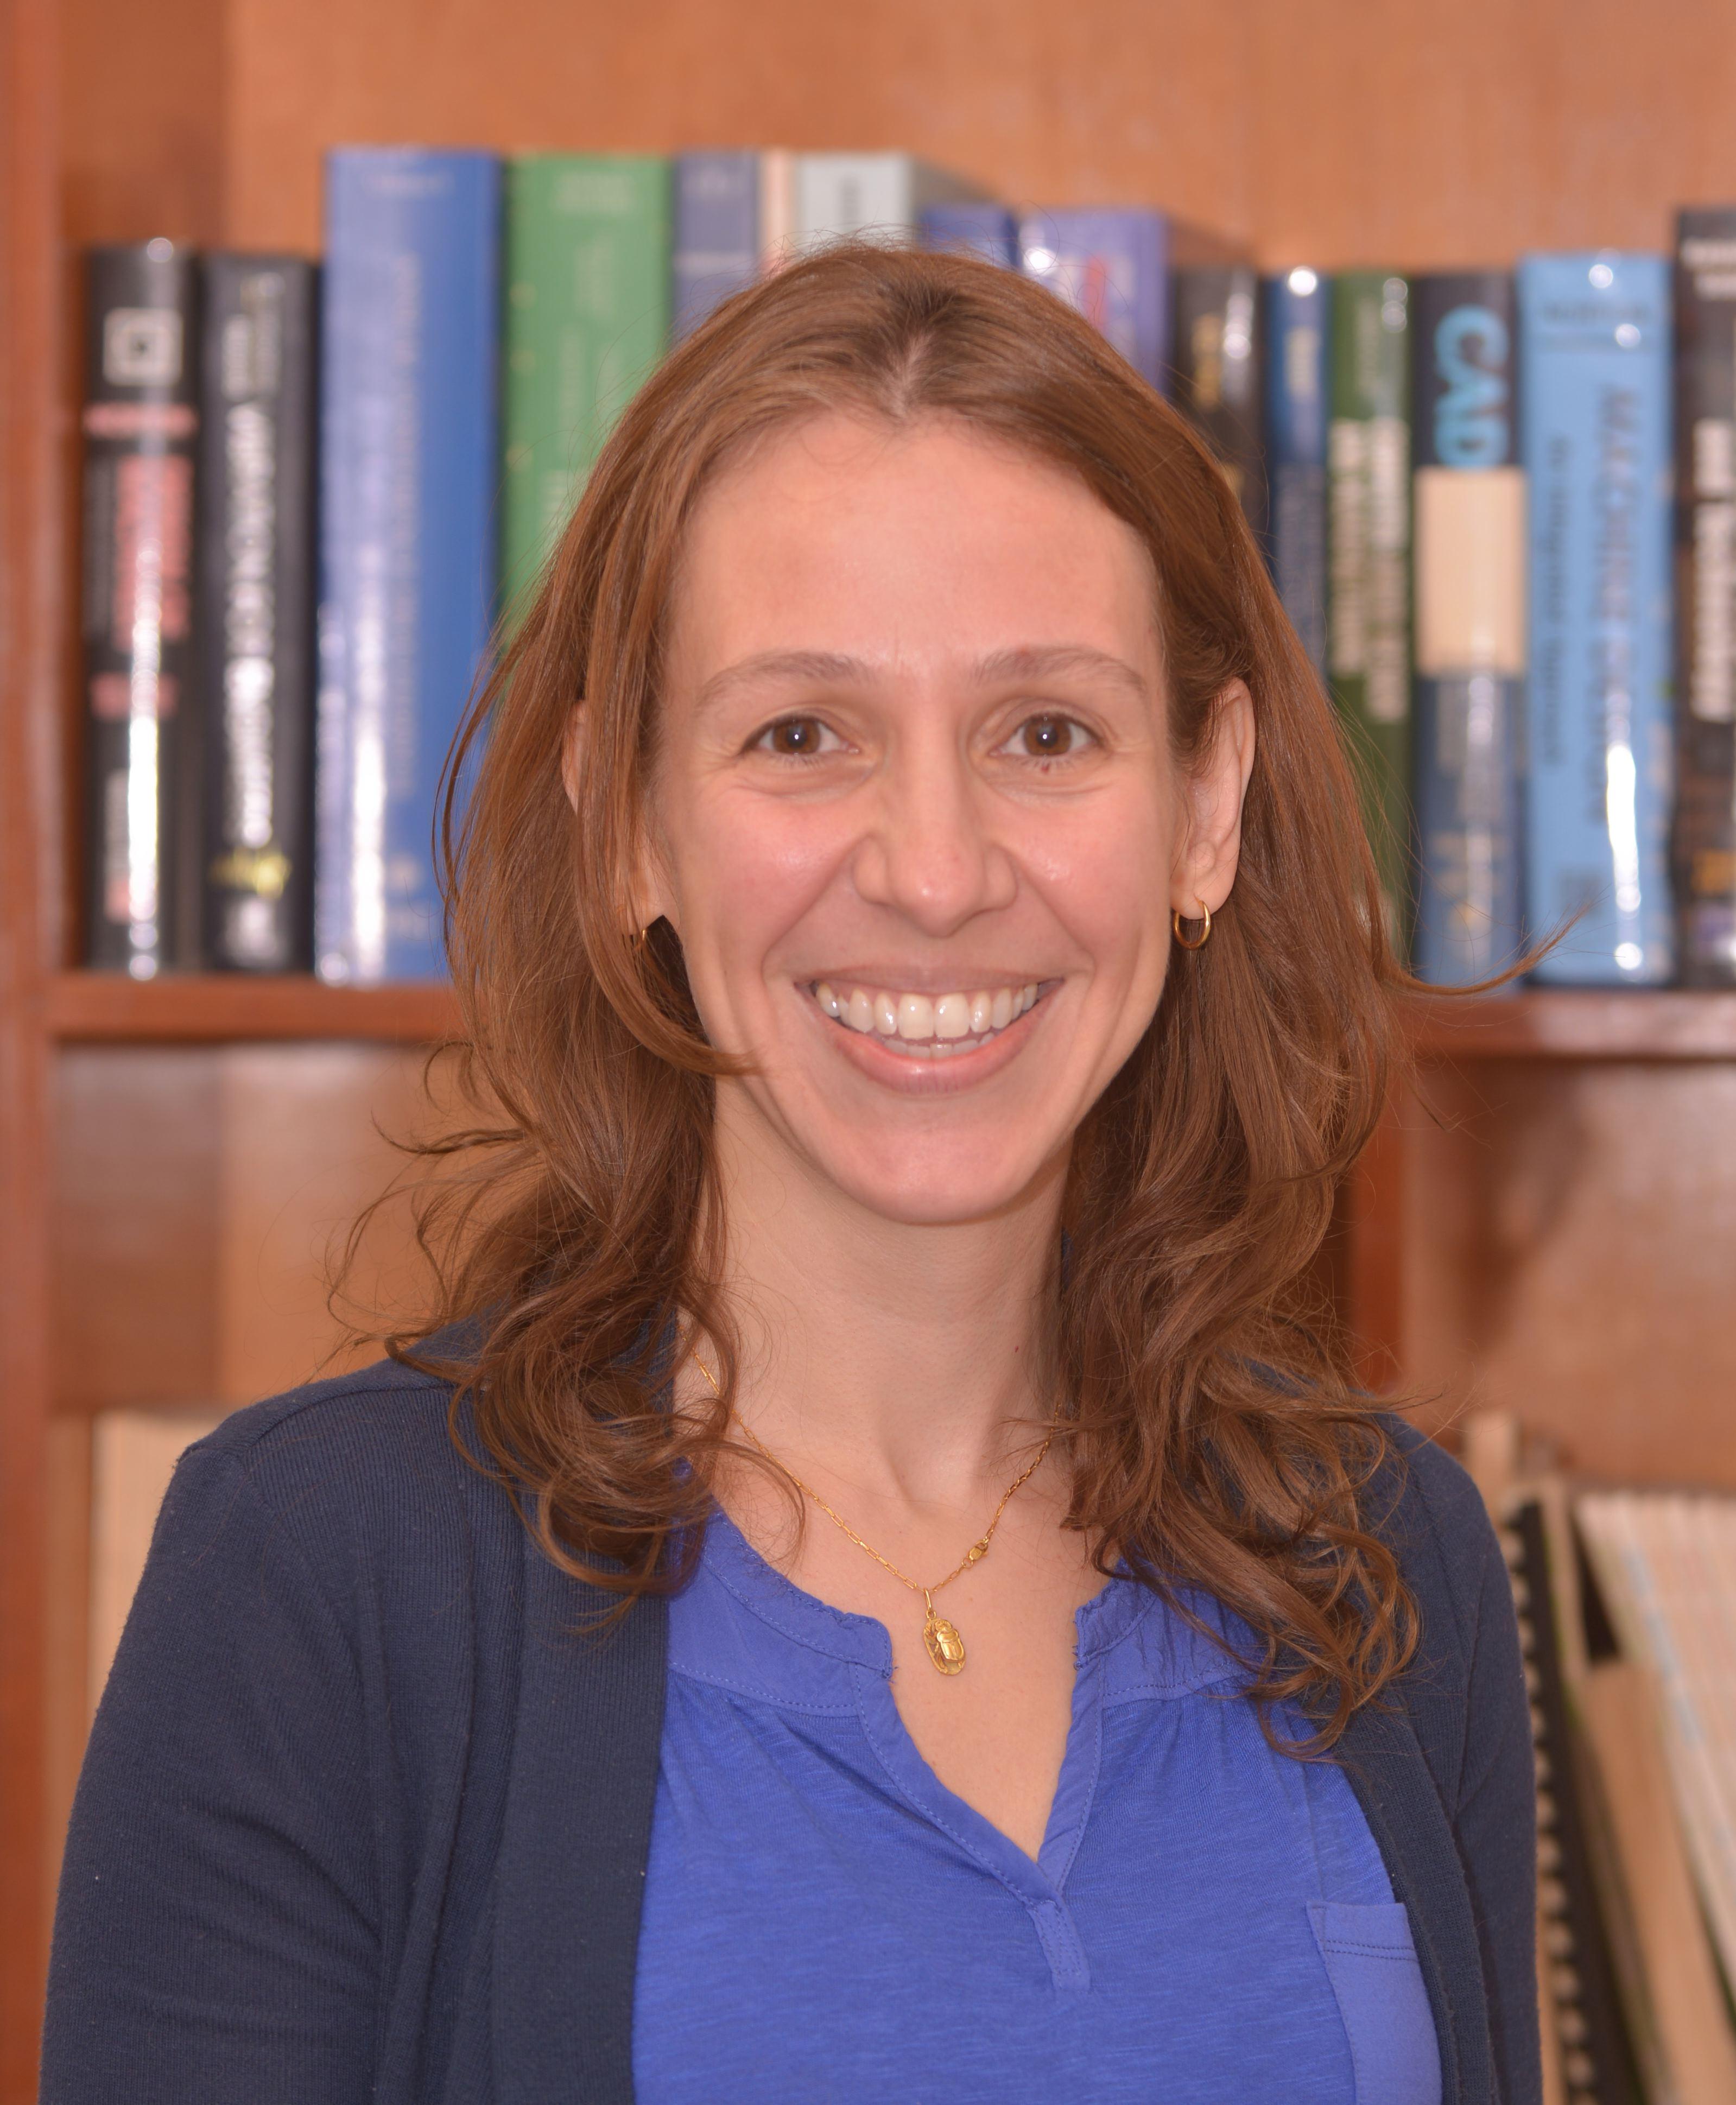 Silvina Cancelos, Ph.D